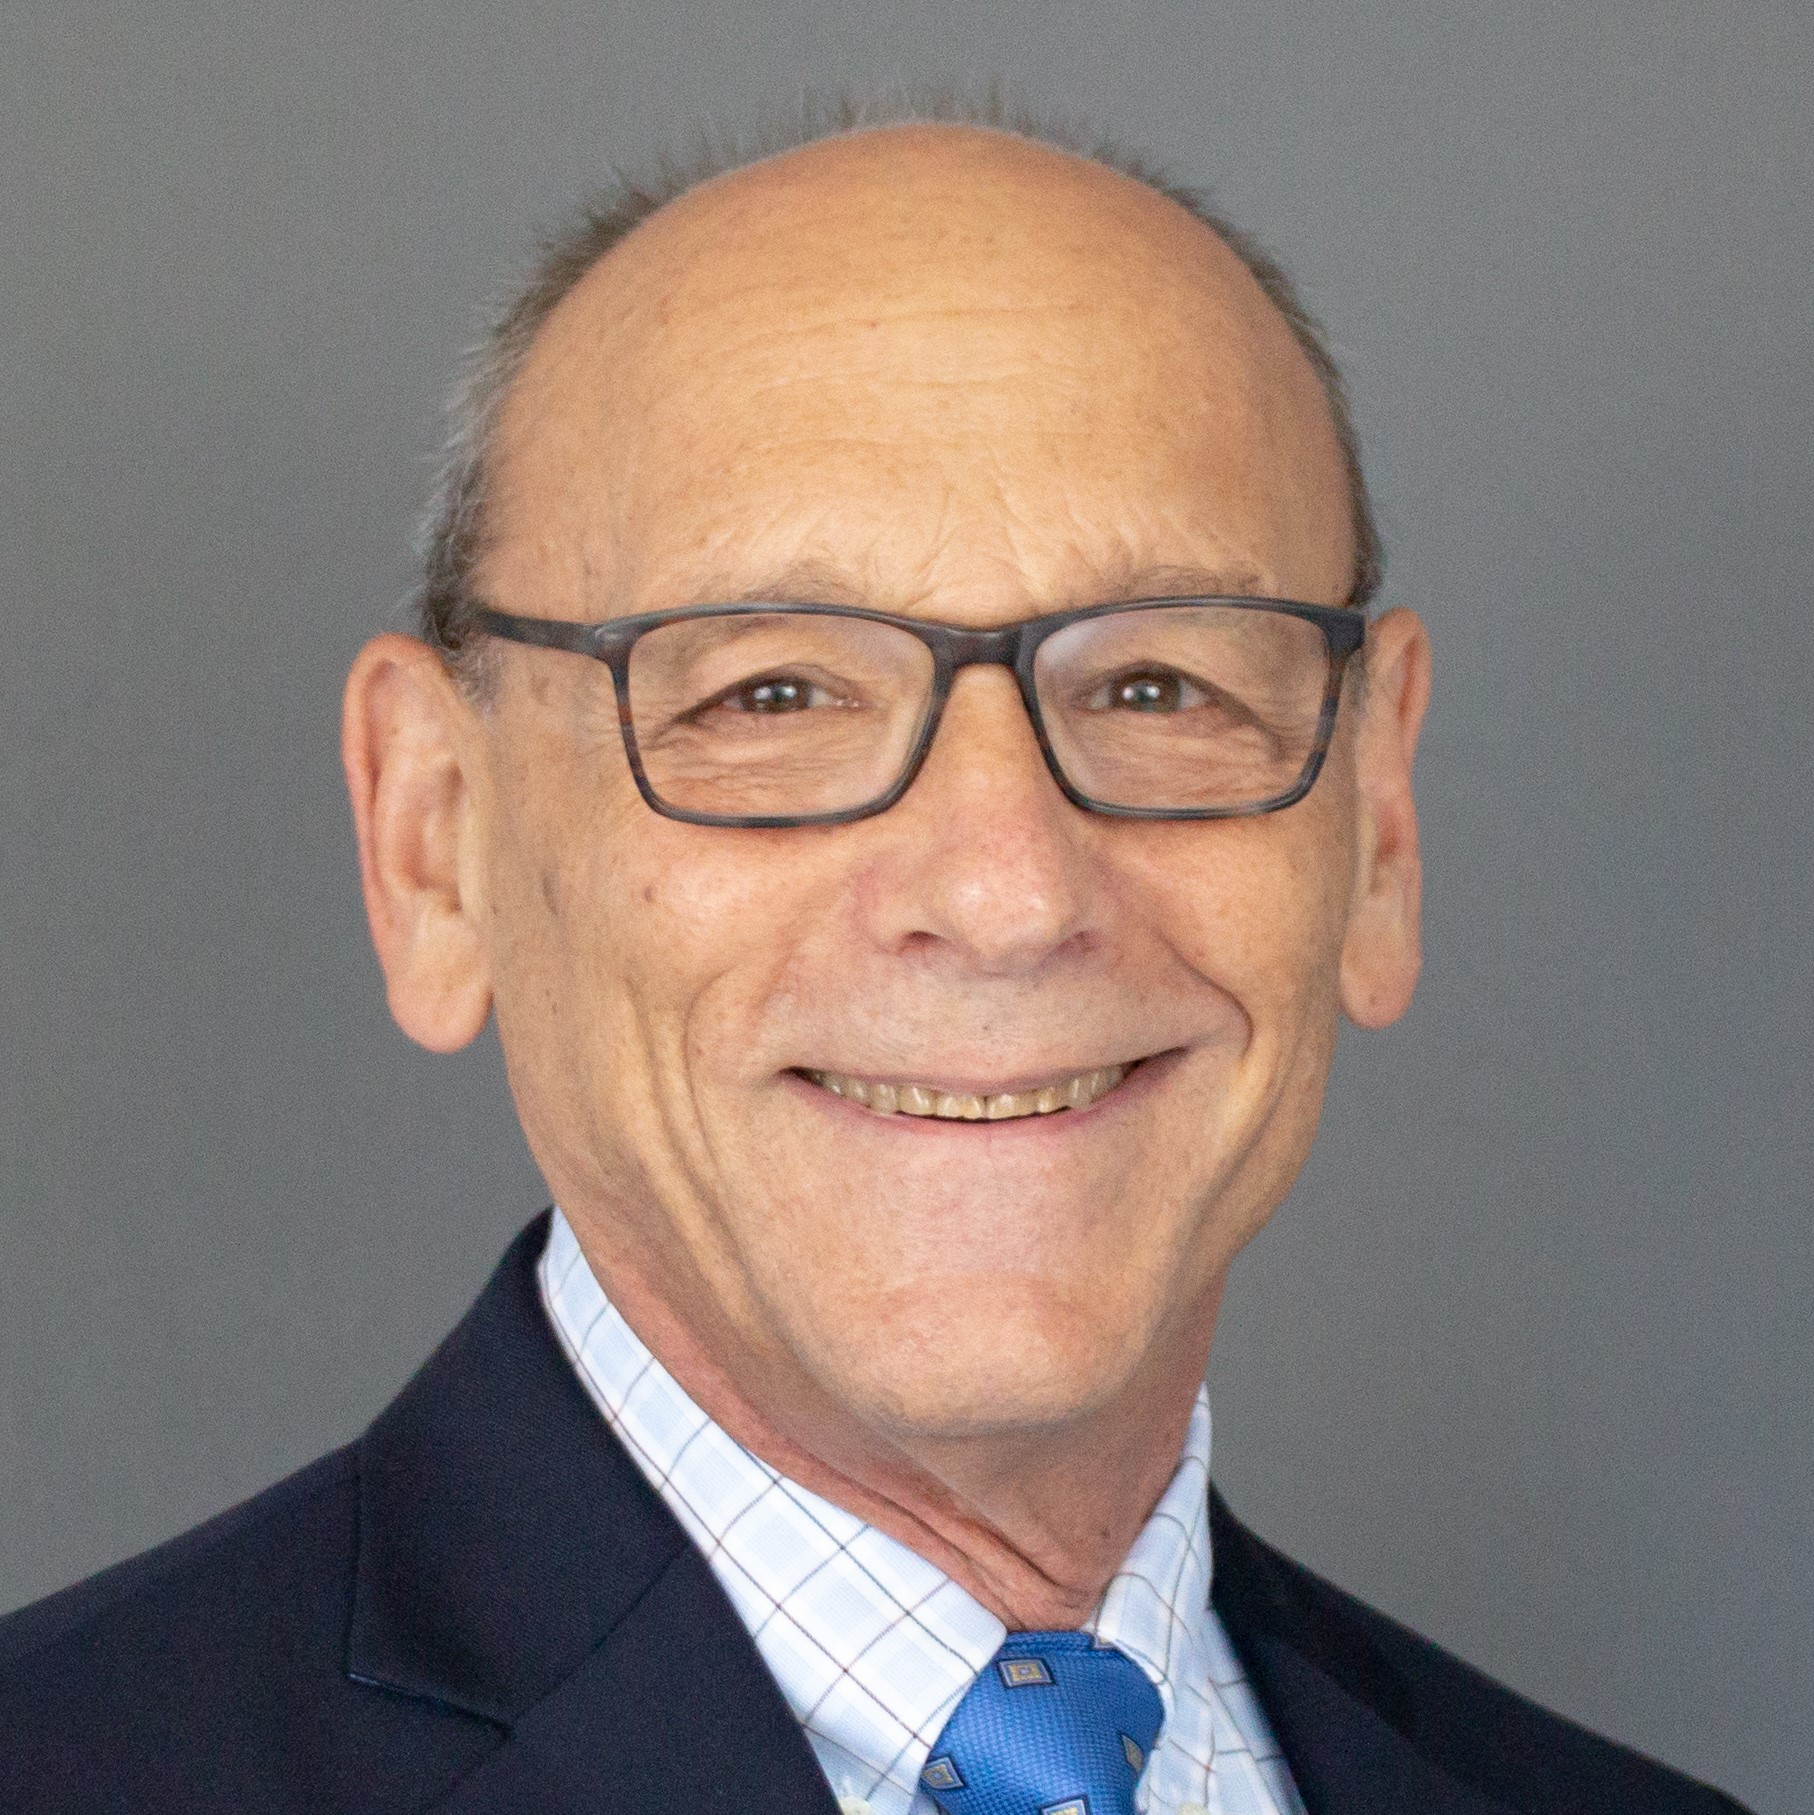 Portrait of Kenneth Janken